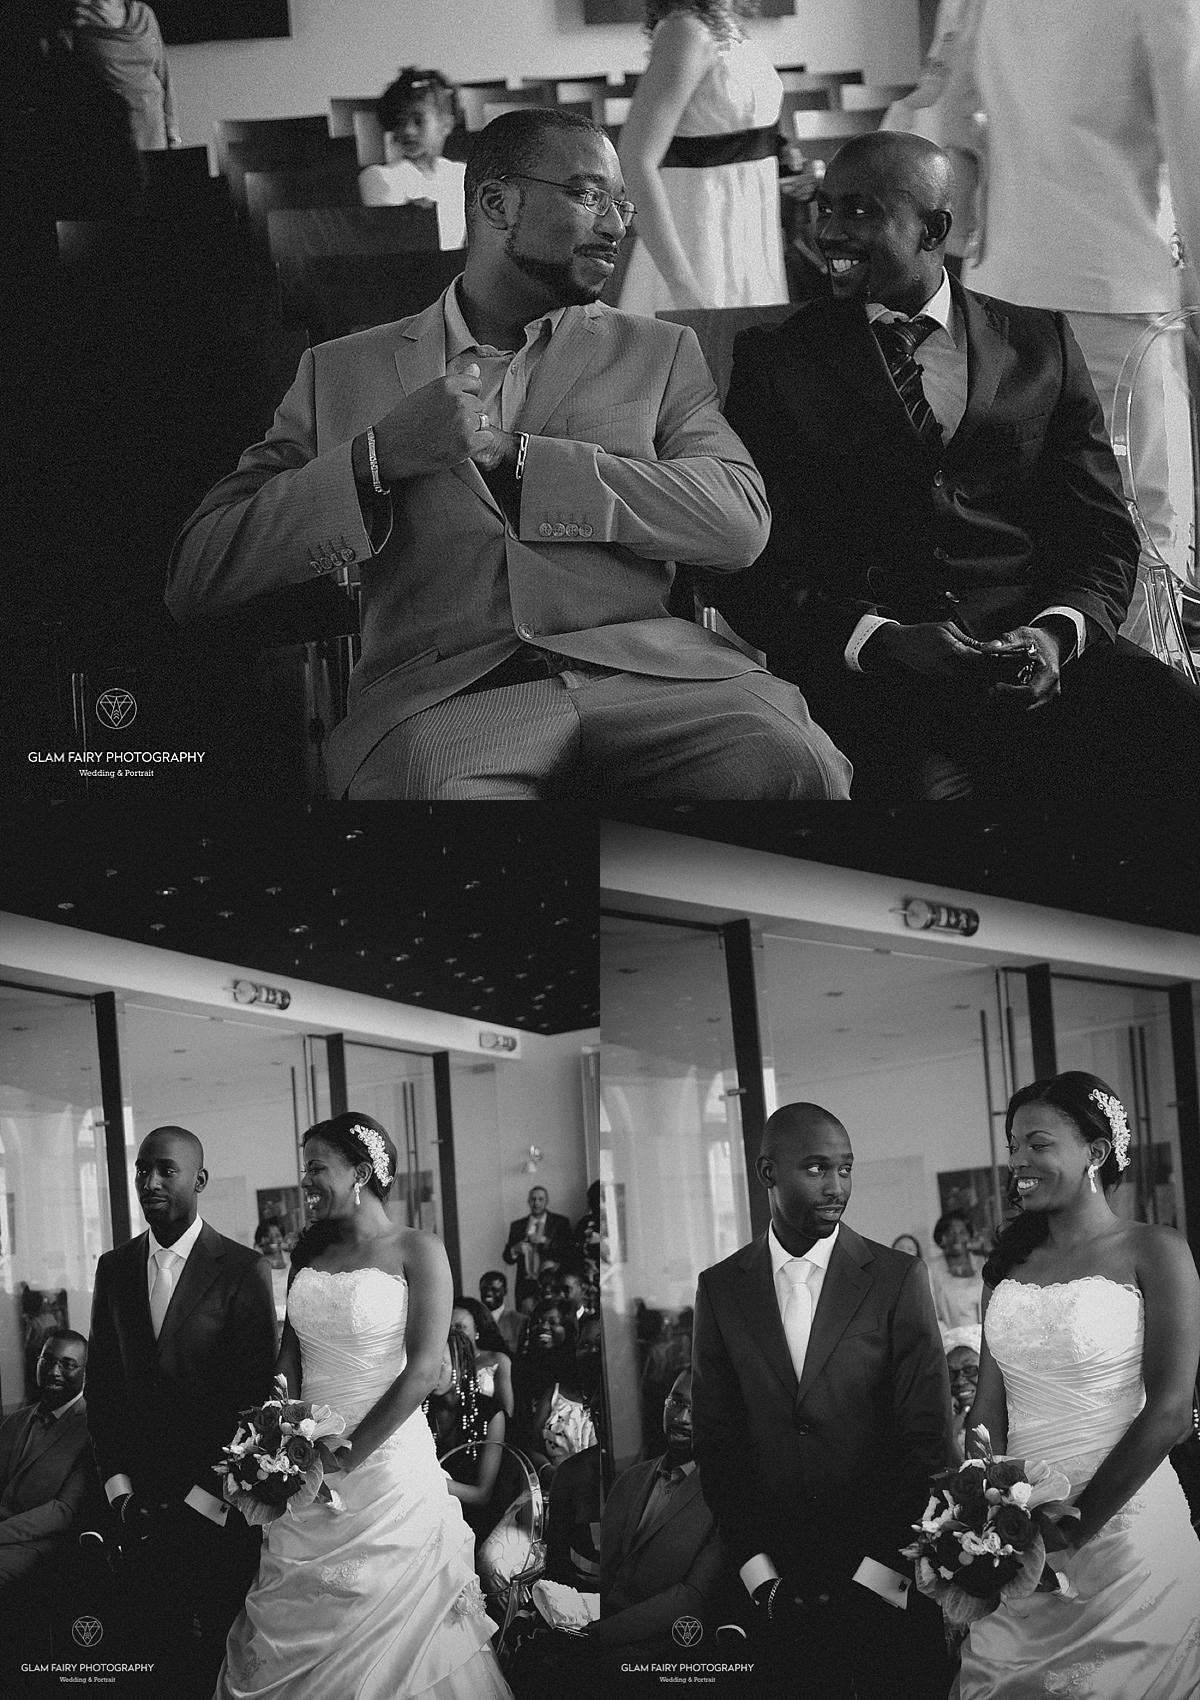 GlamFairyPhotography-mariage-afro-antillais-orsay-candy_0007